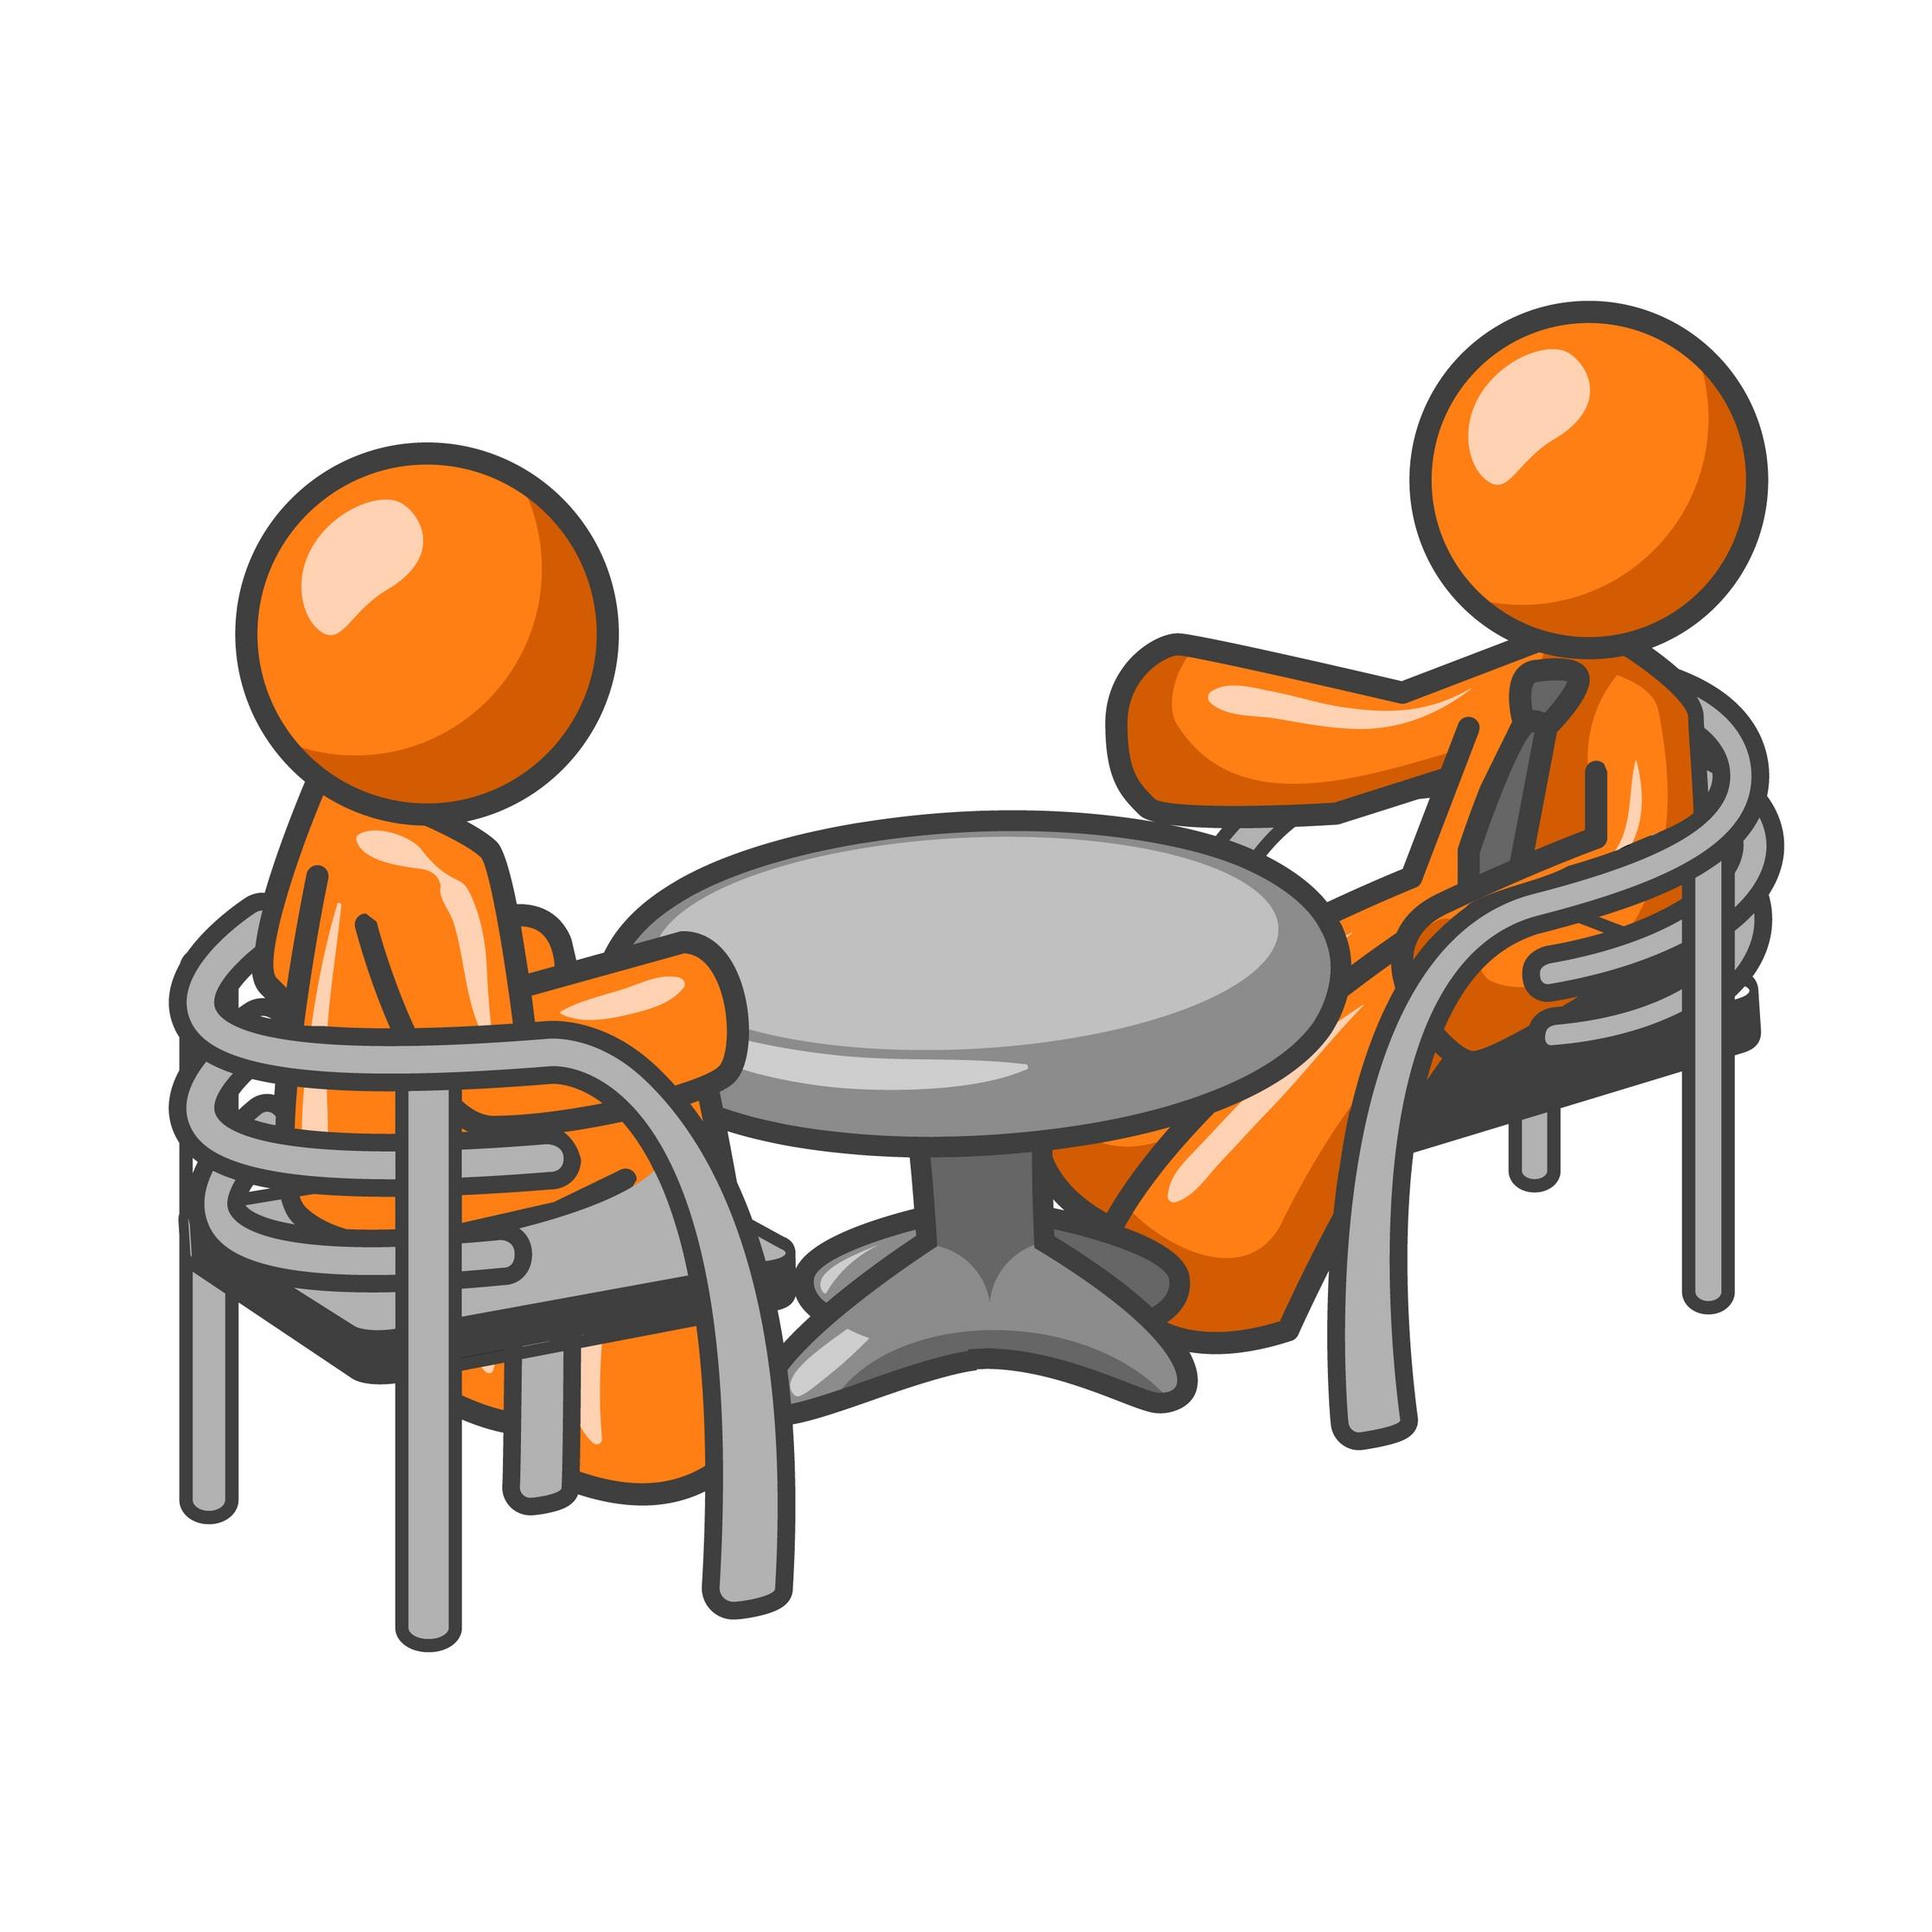 2236x2236 Interview Clipart